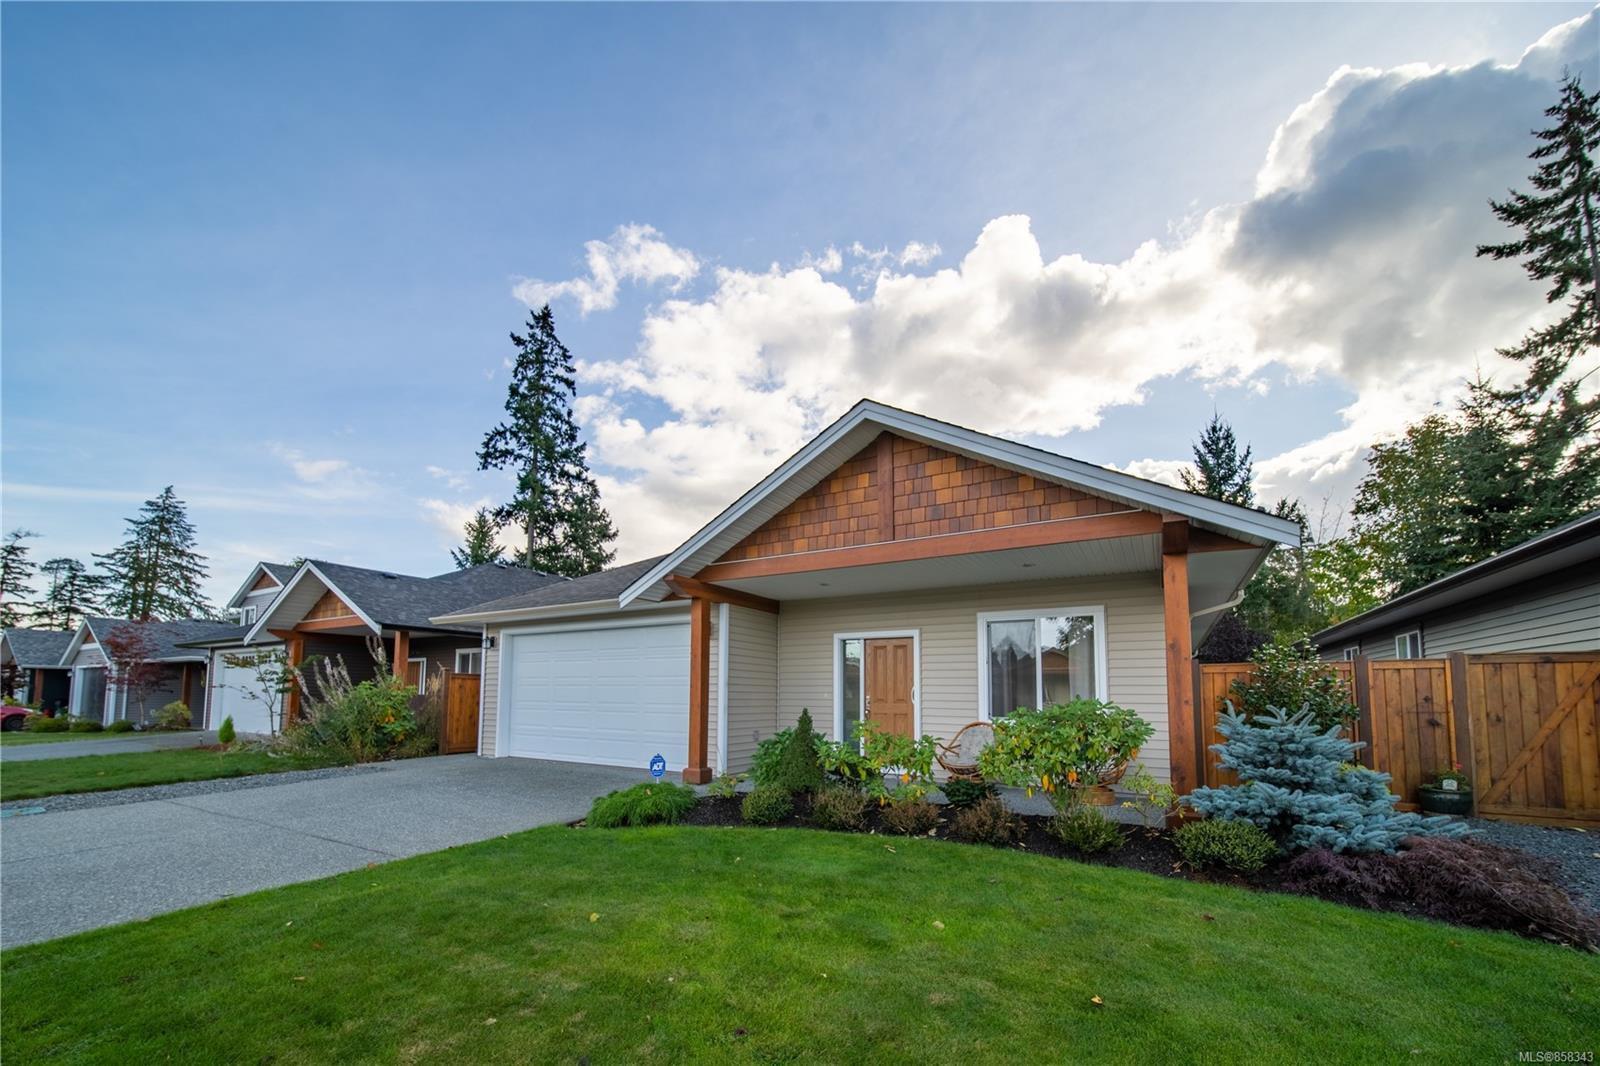 Main Photo: 2235 Bourbon Rd in : Na Central Nanaimo House for sale (Nanaimo)  : MLS®# 858343